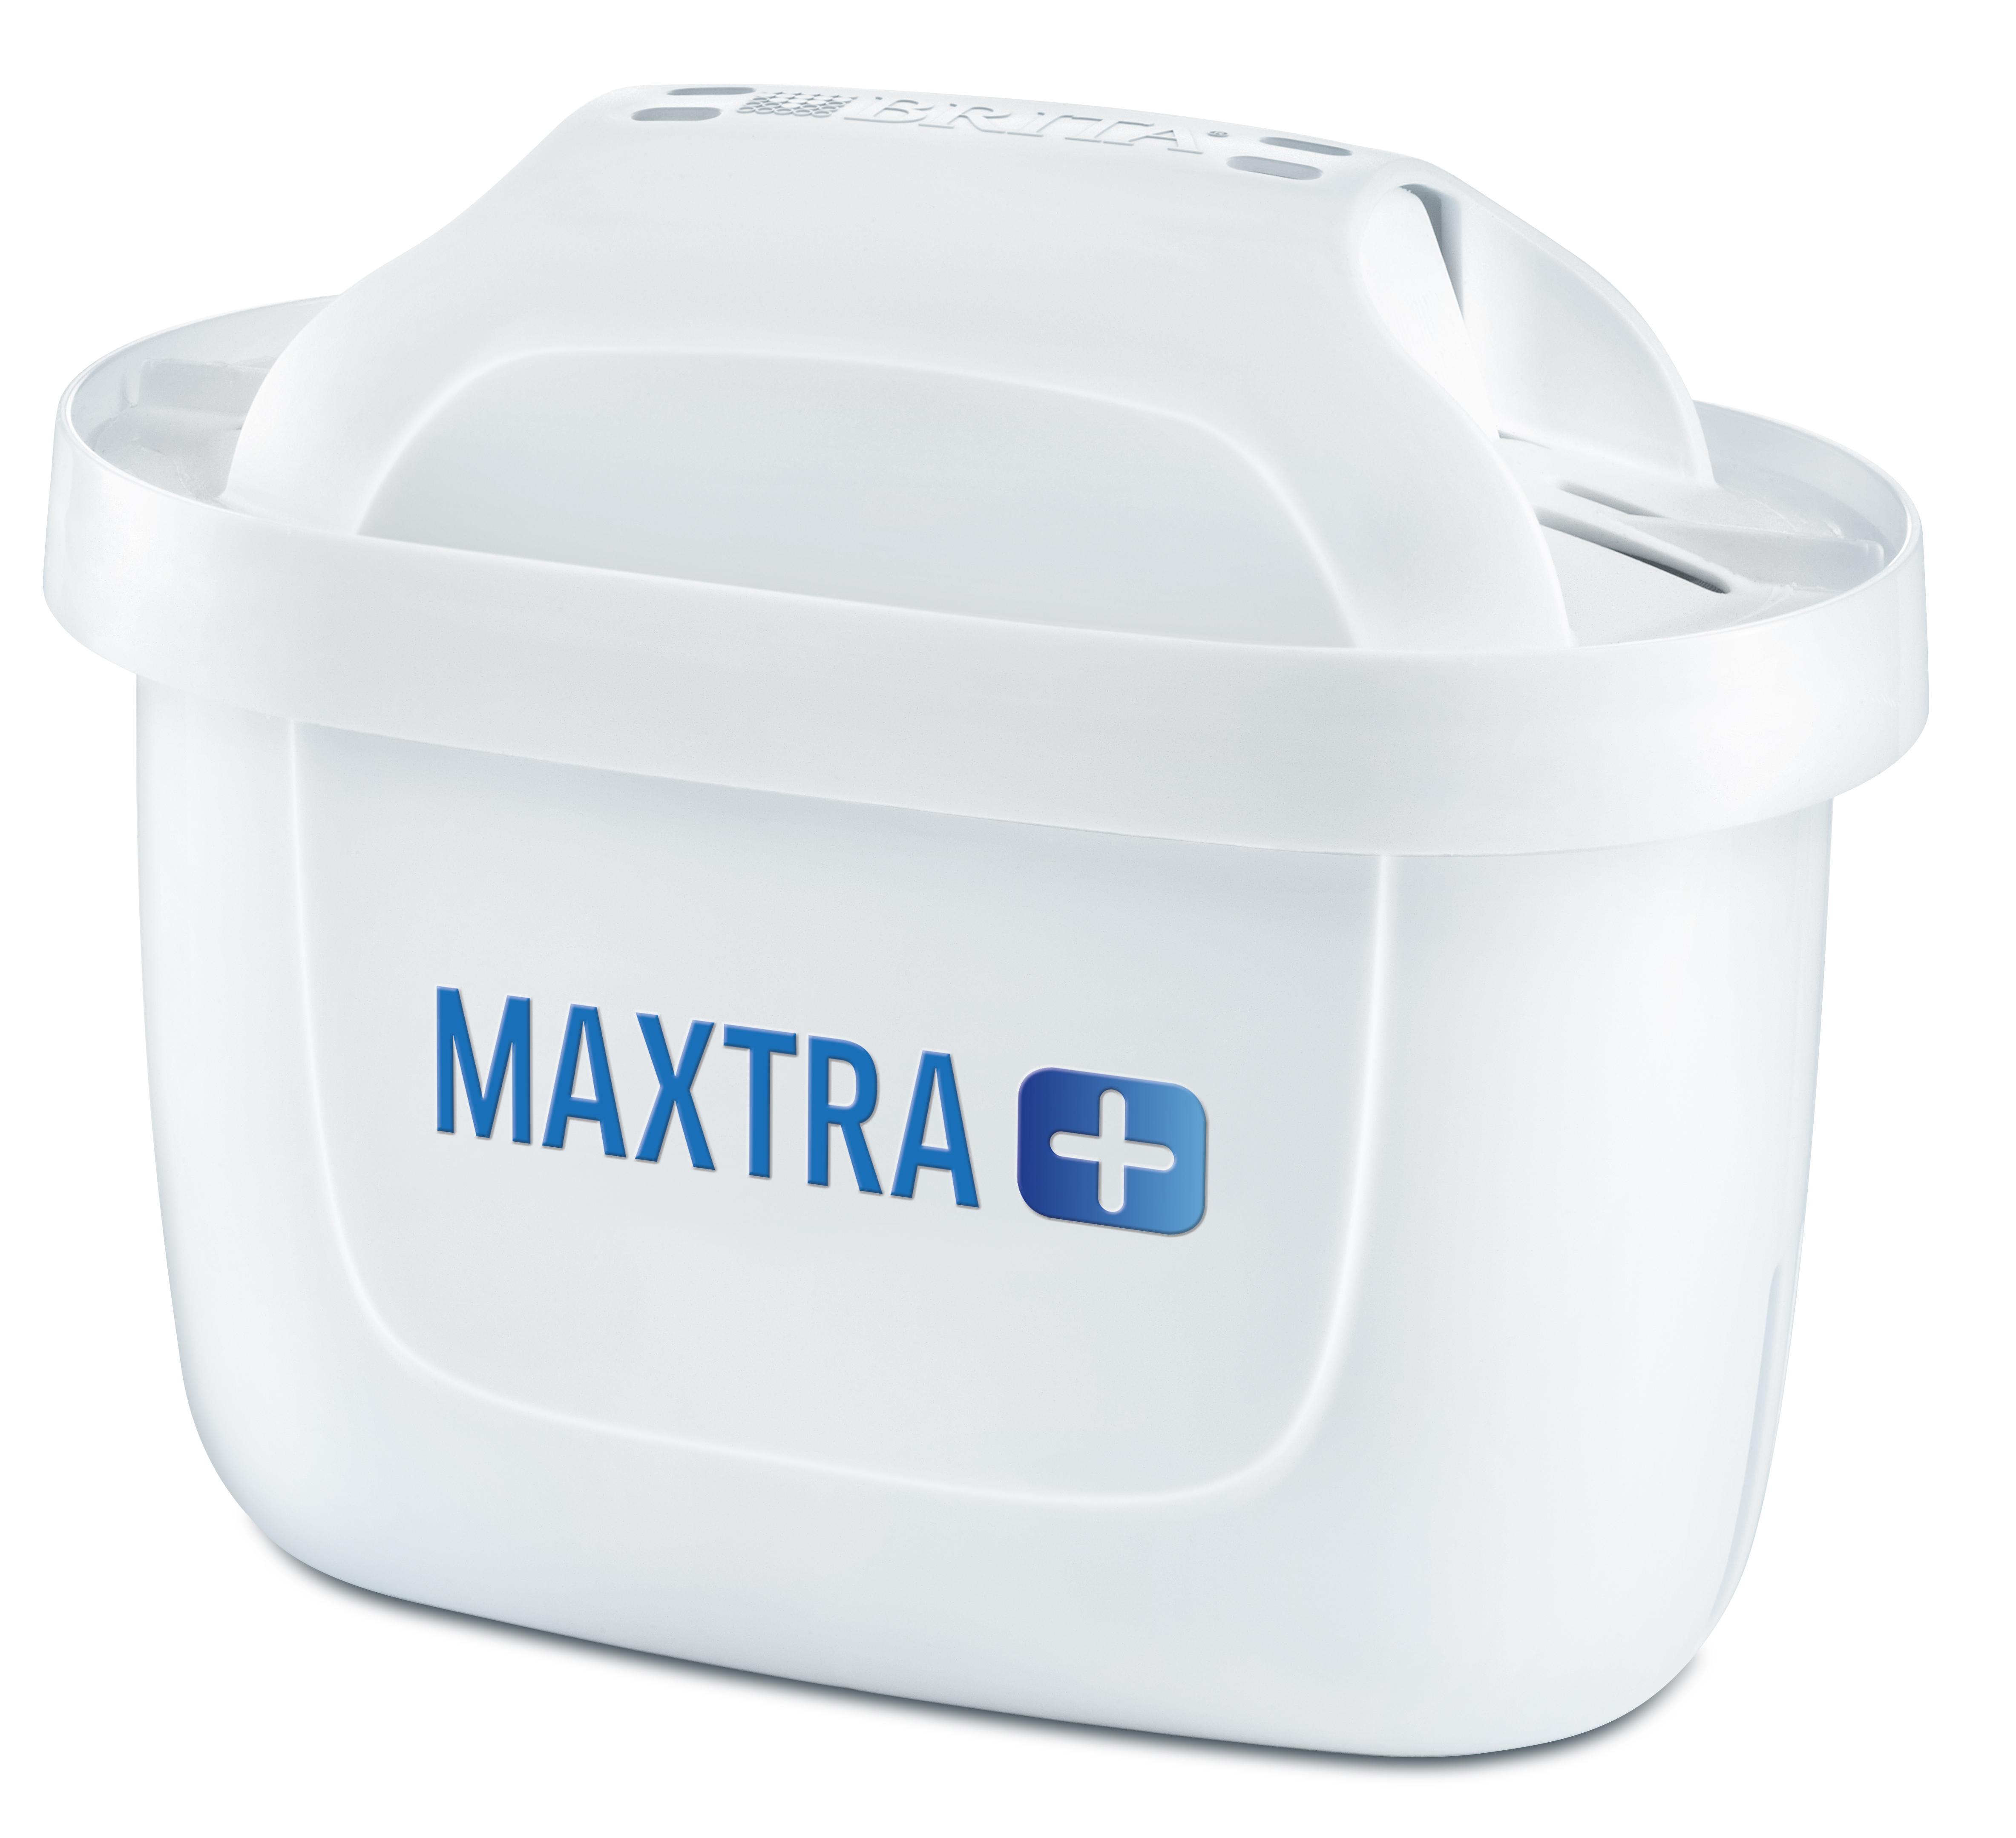 brita 1023124 filterkartuschen maxtra 4er pack wei k che haushalt. Black Bedroom Furniture Sets. Home Design Ideas